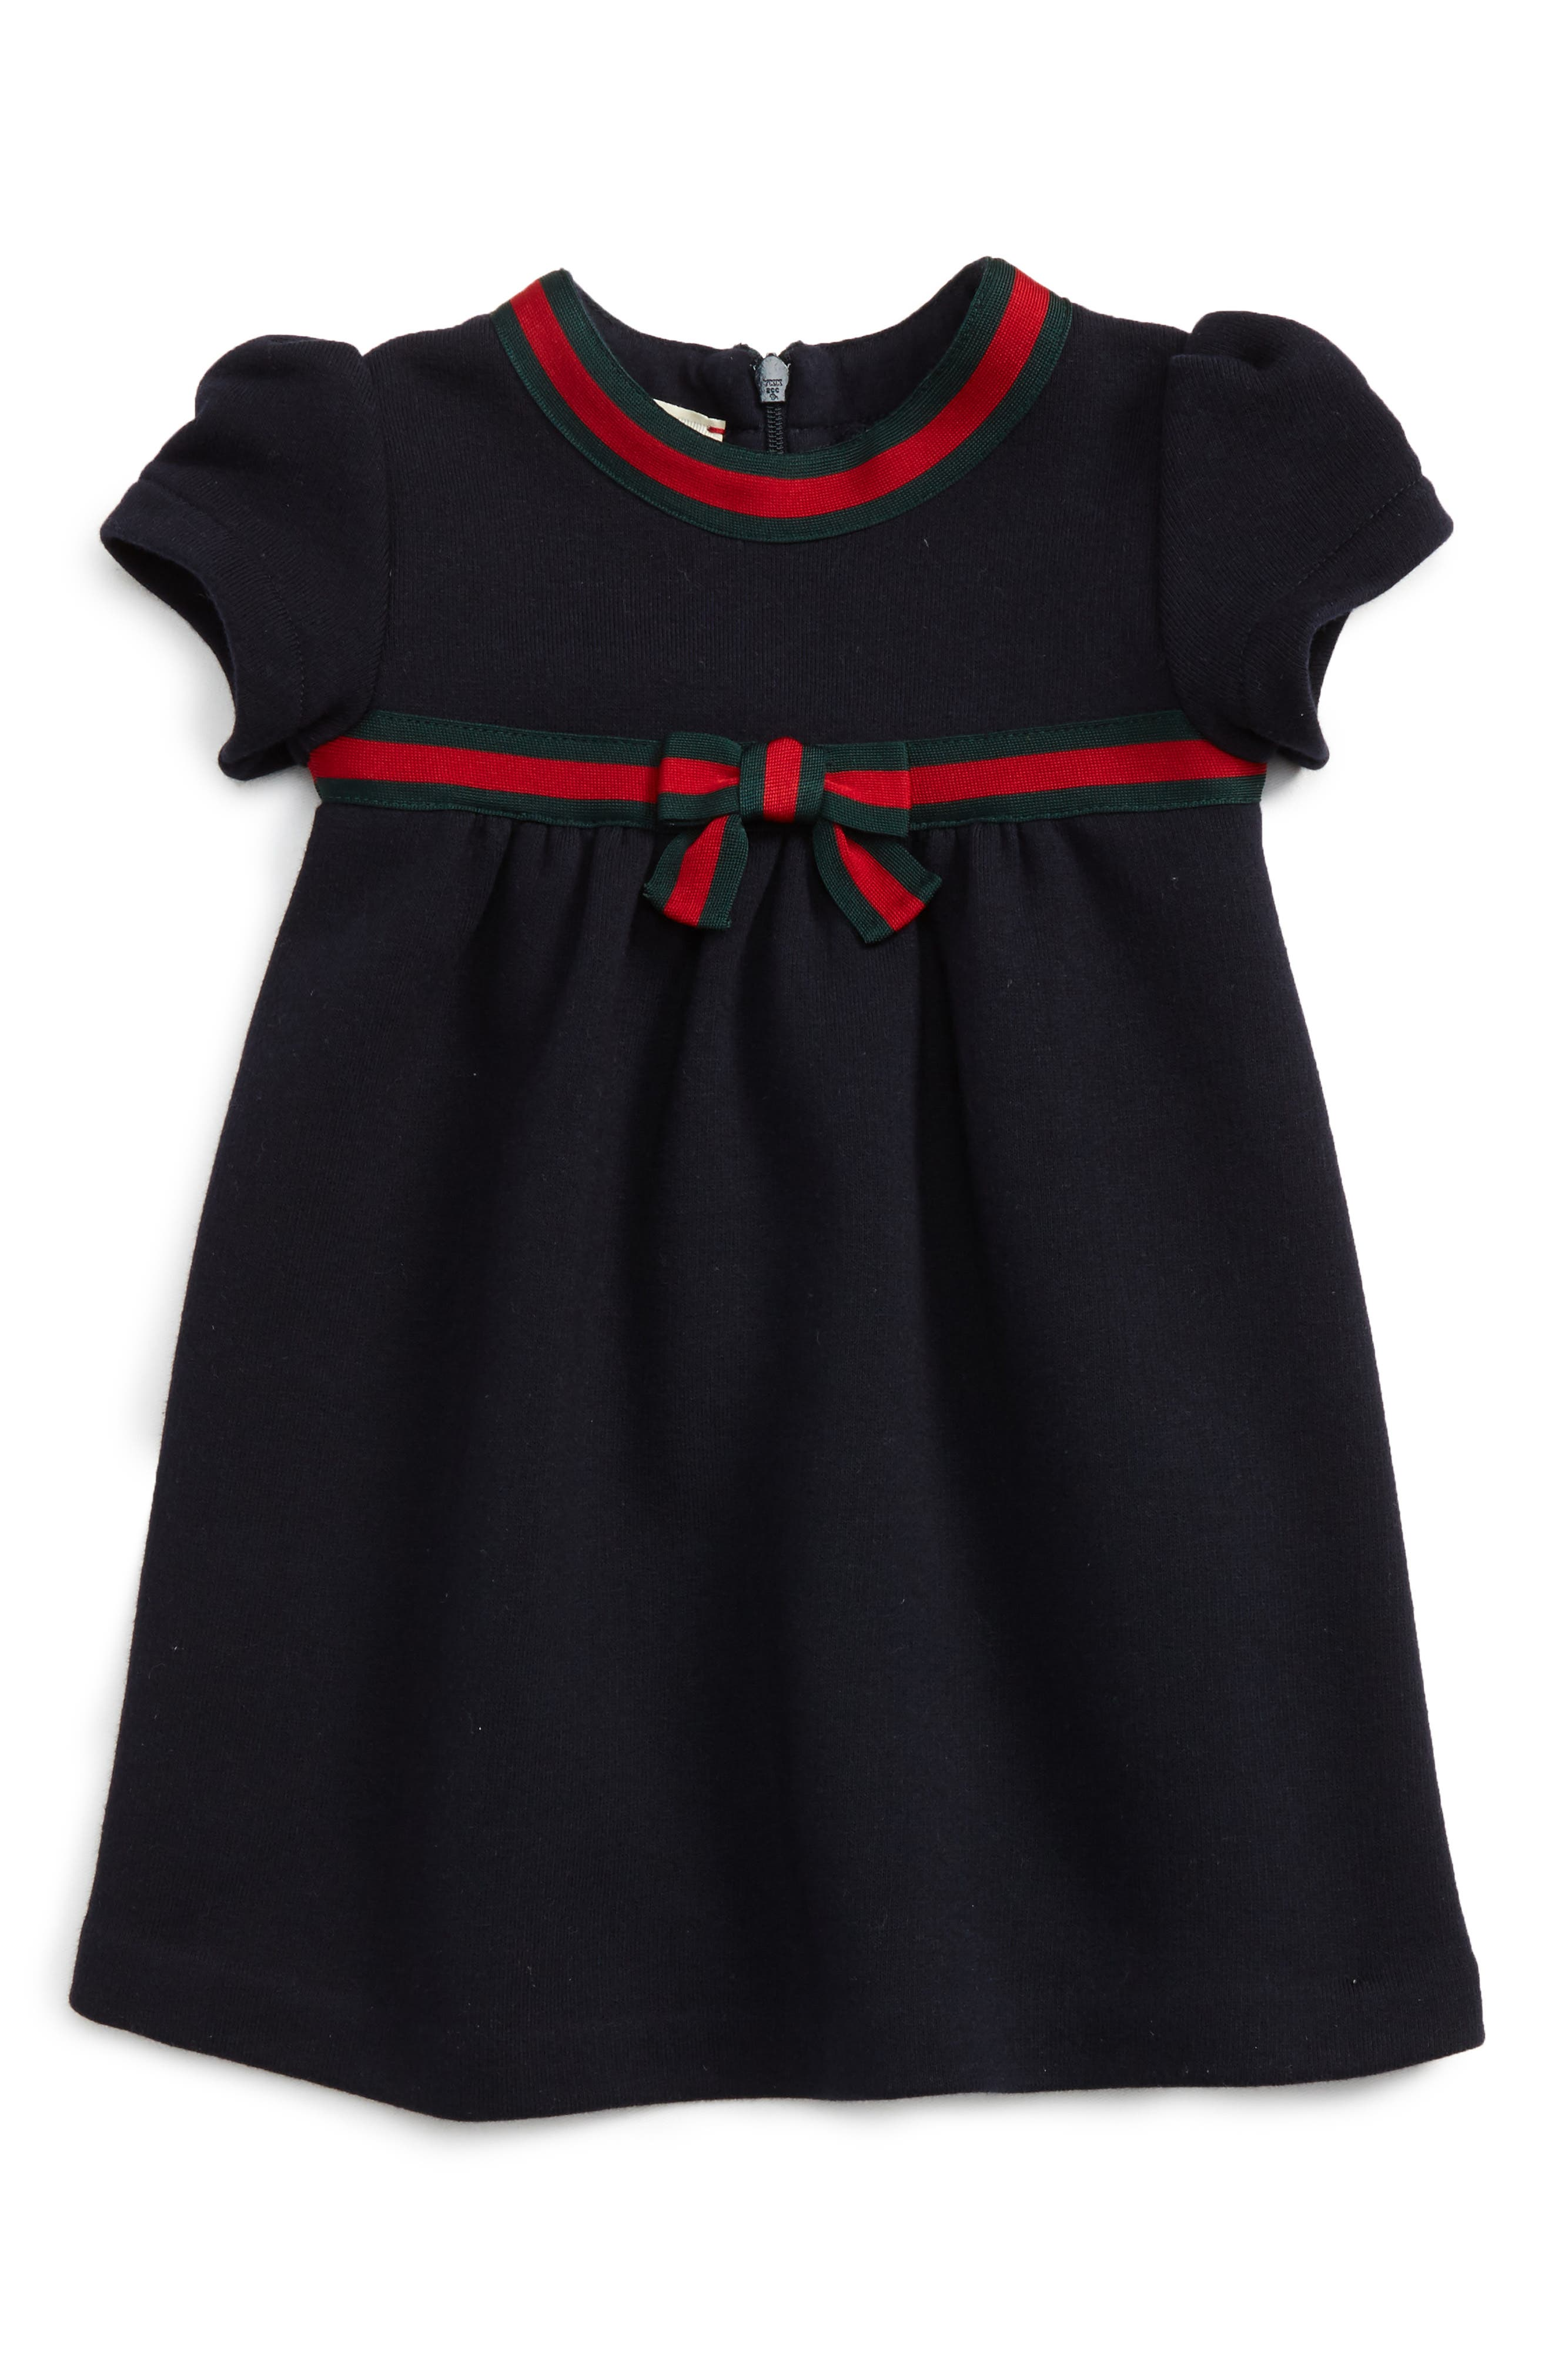 Gucci Stripe Bow Dress (Baby Girls)